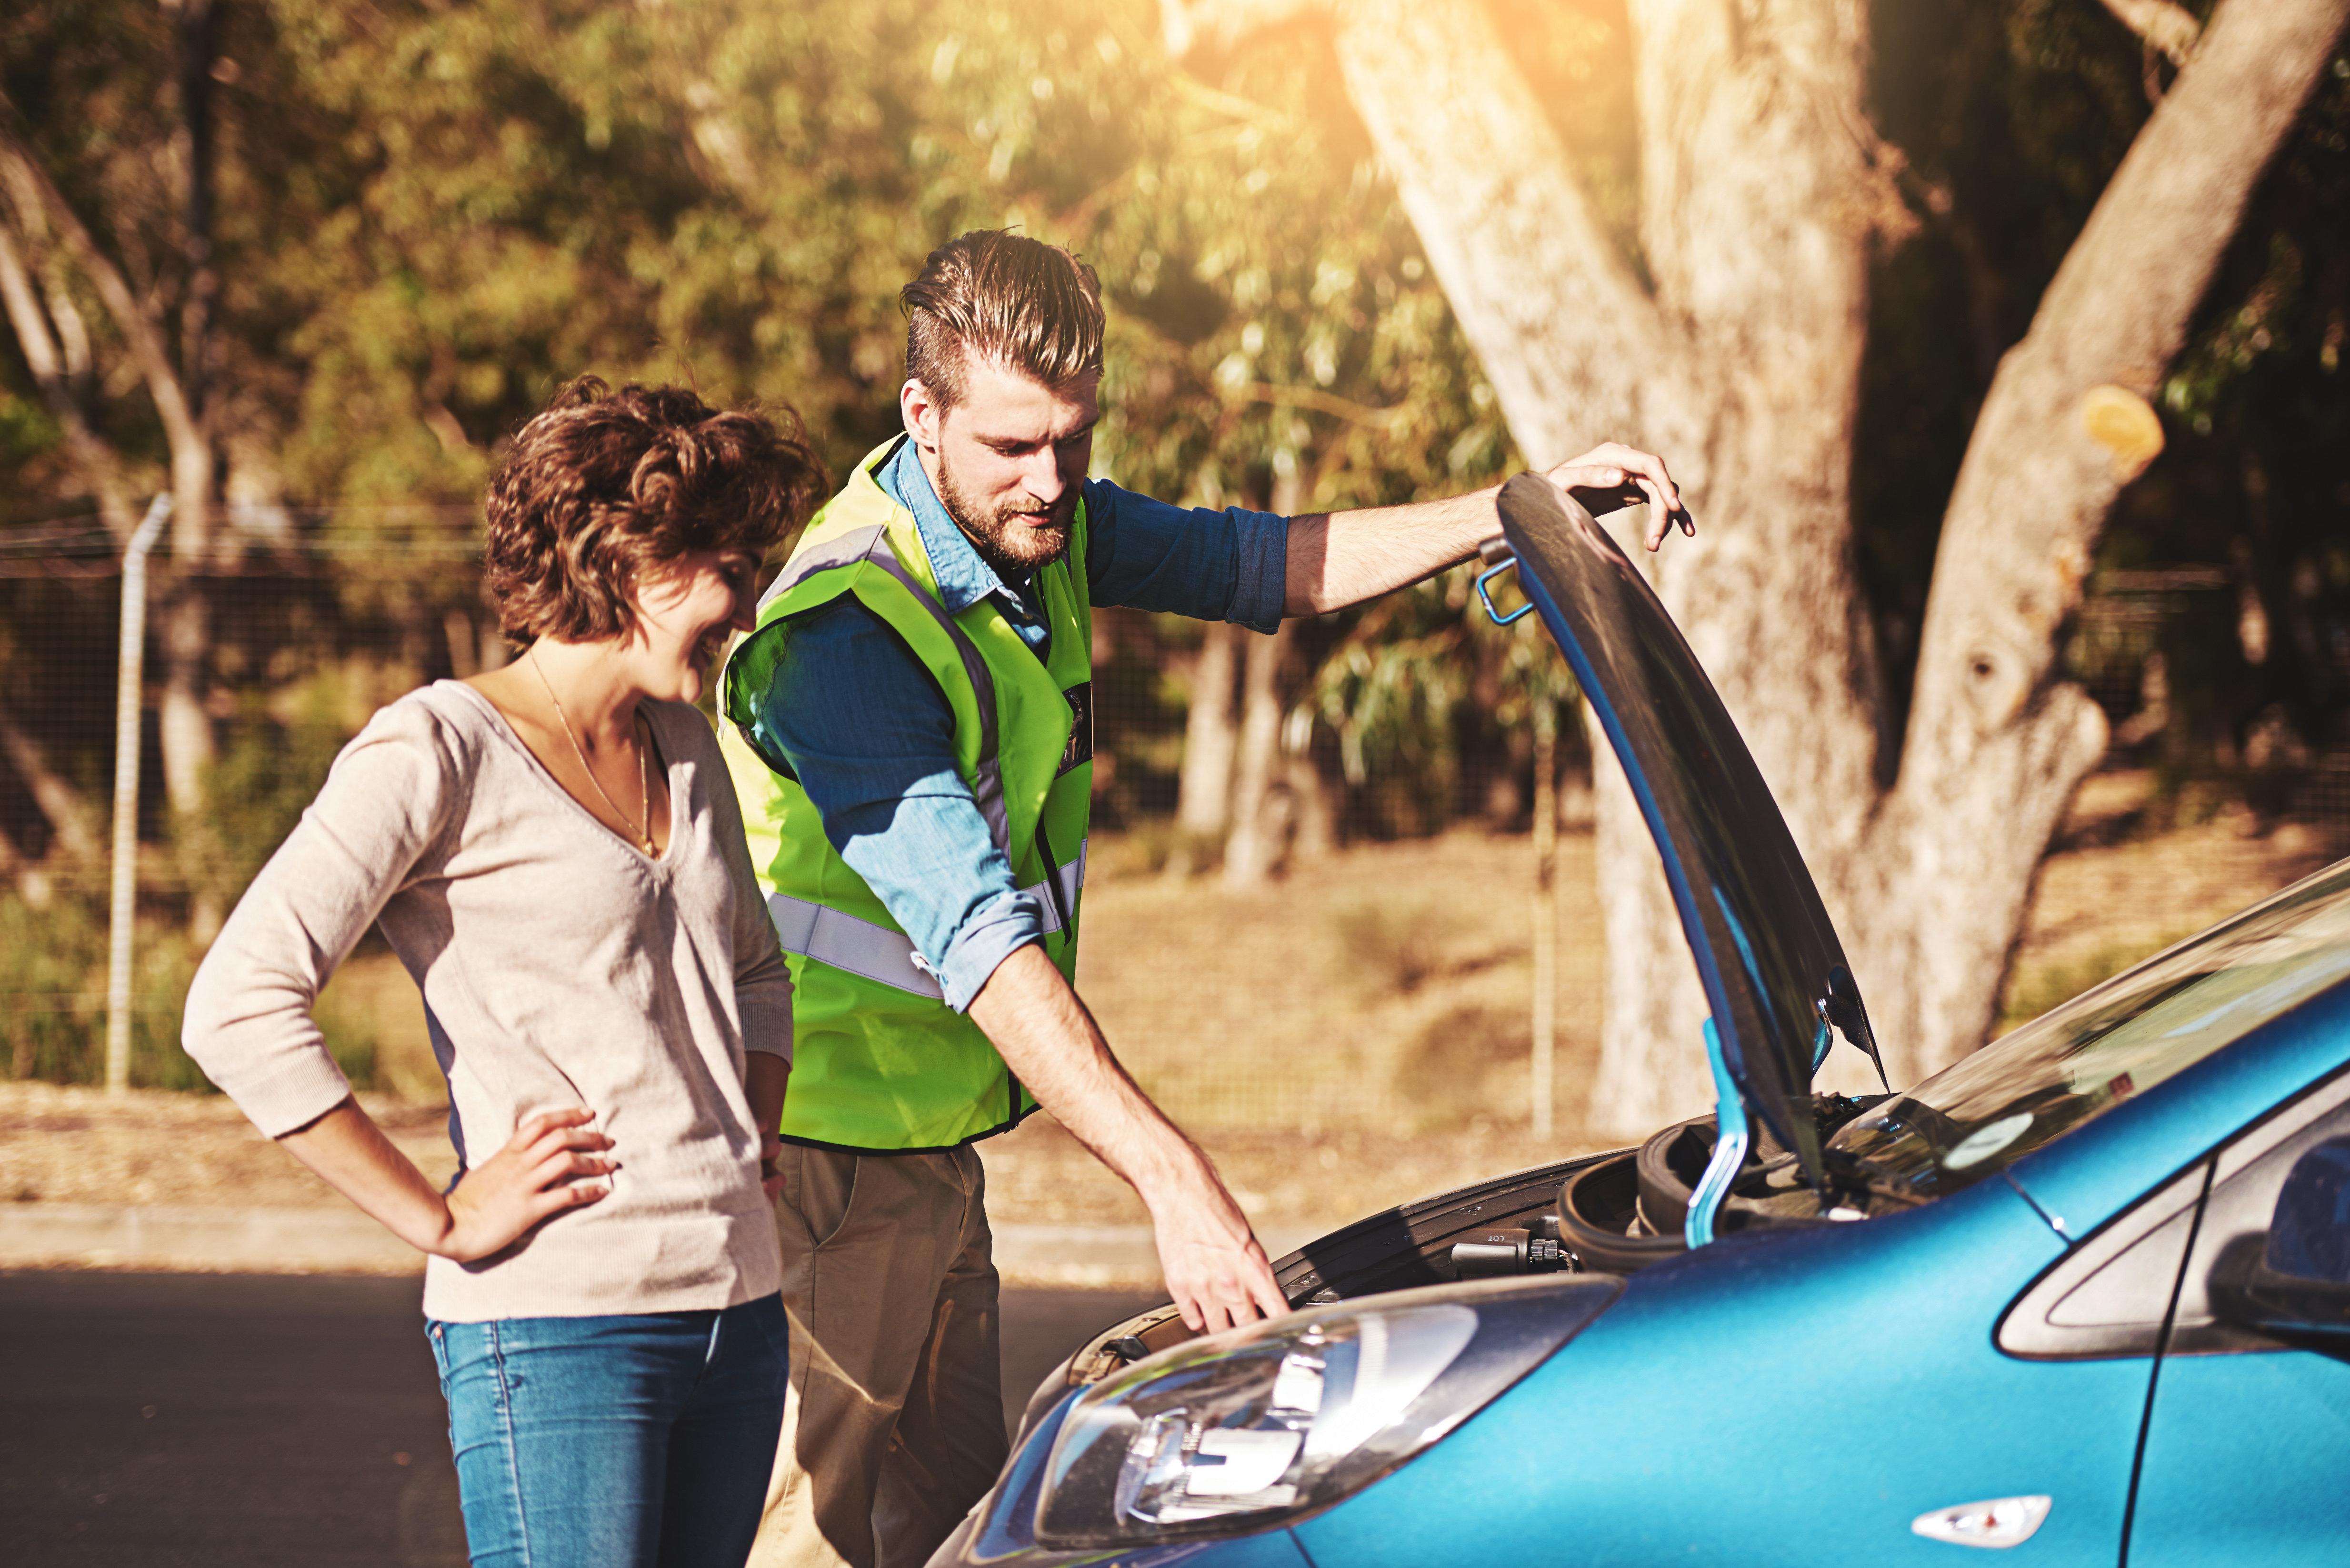 Paar fährt 200 Kilometer mit dem Auto – dann hört es Miauen im